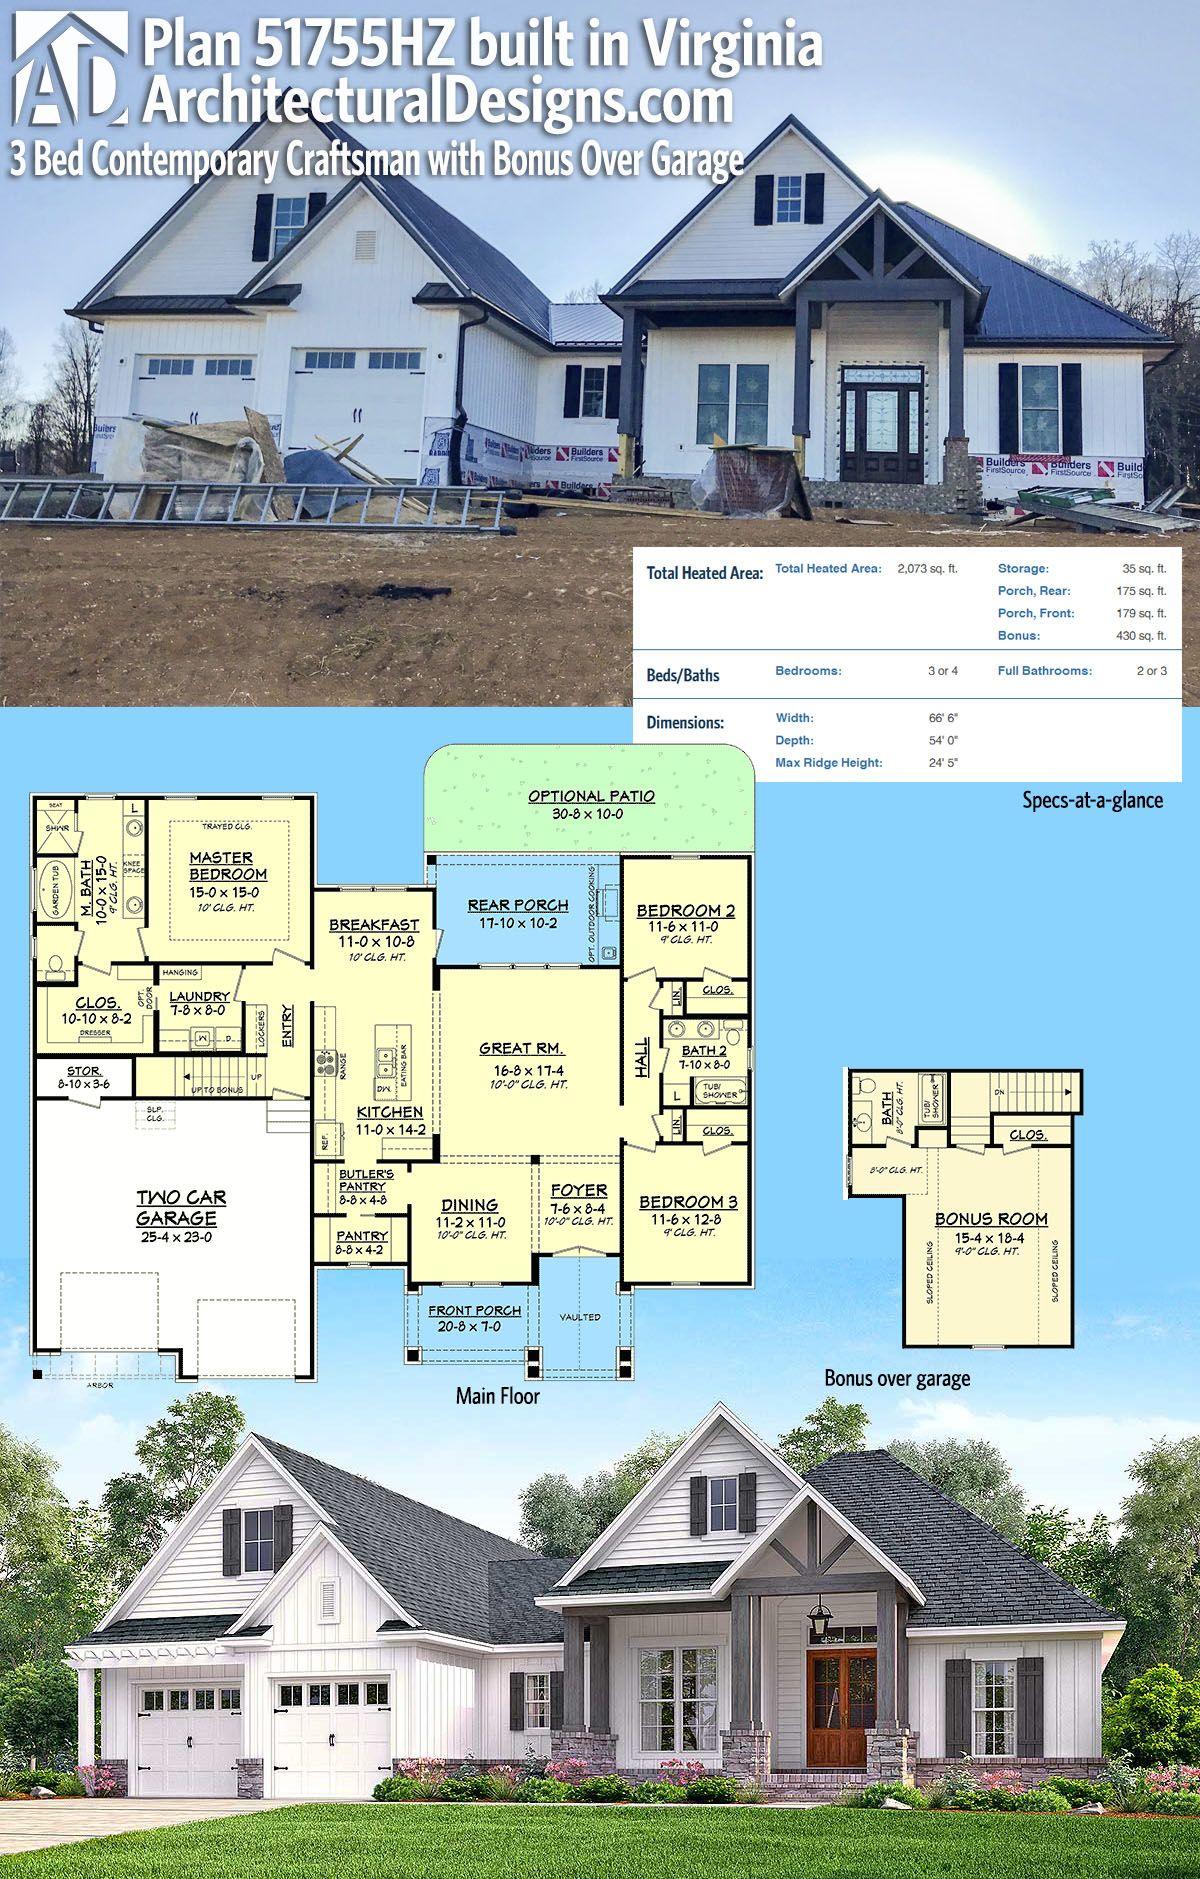 Architectural Designs House Plan 51755HZ under construction